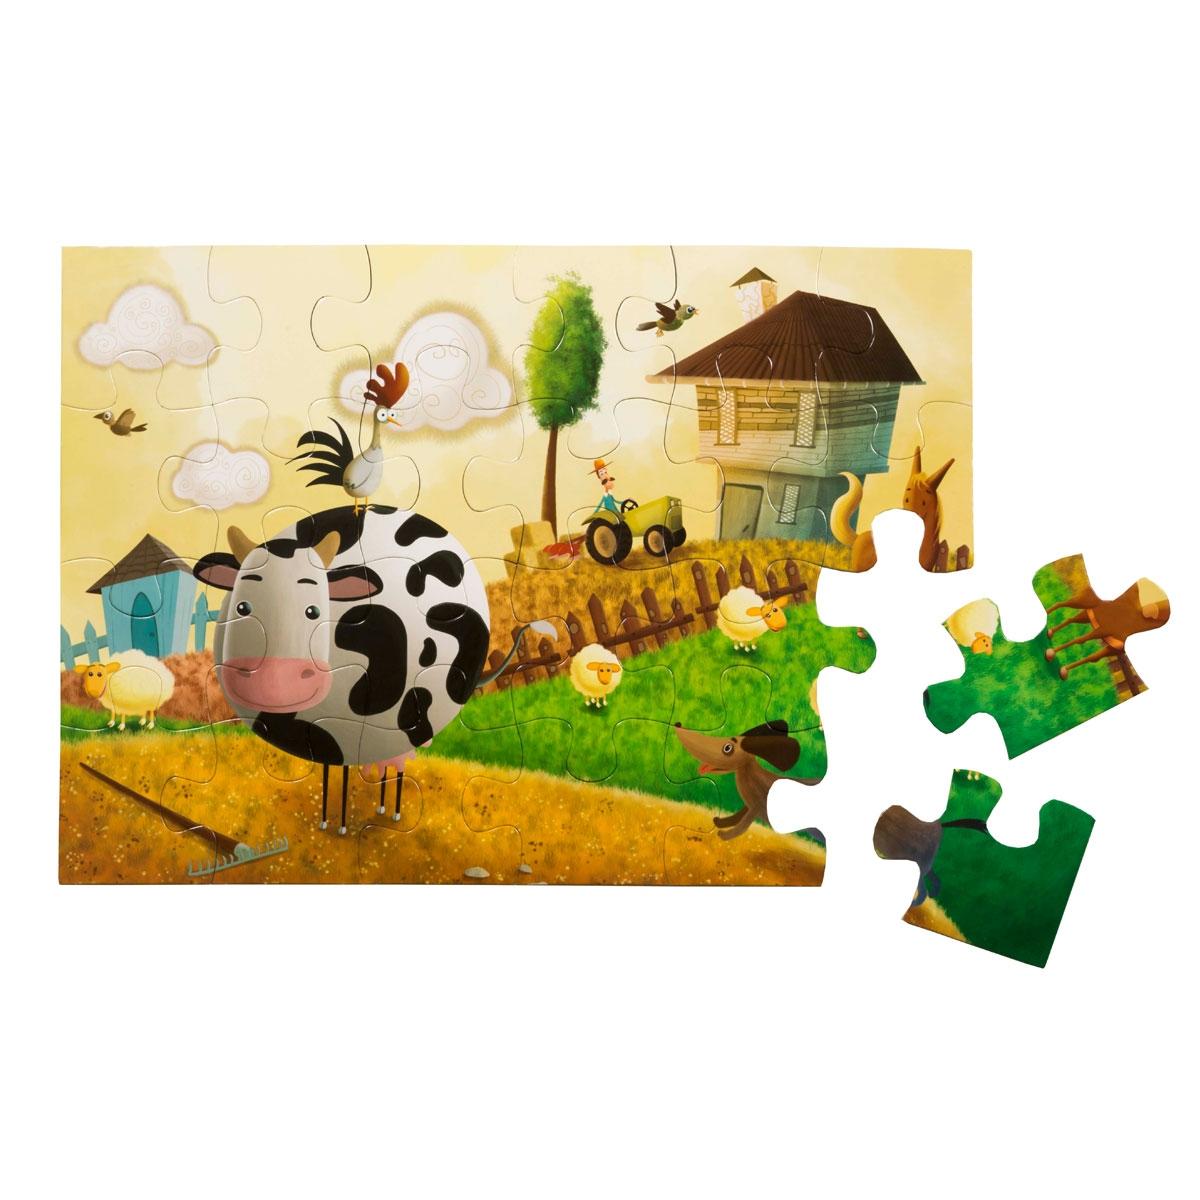 Floor Puzzle - At the Farm